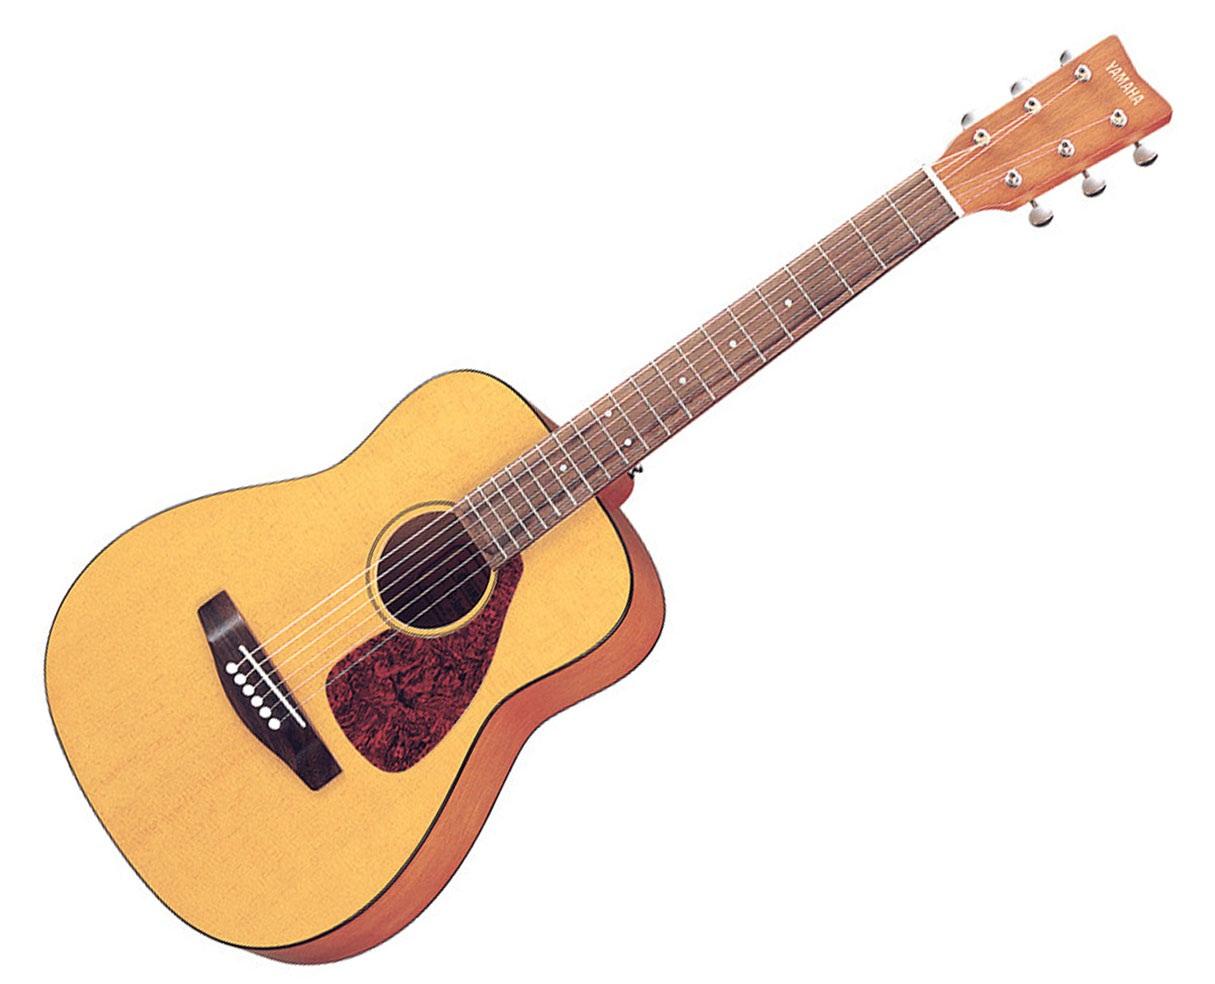 Yamaha jr1 3 4 scale acoustic guitar natural ebay for Yamaha acoustic guitar ebay